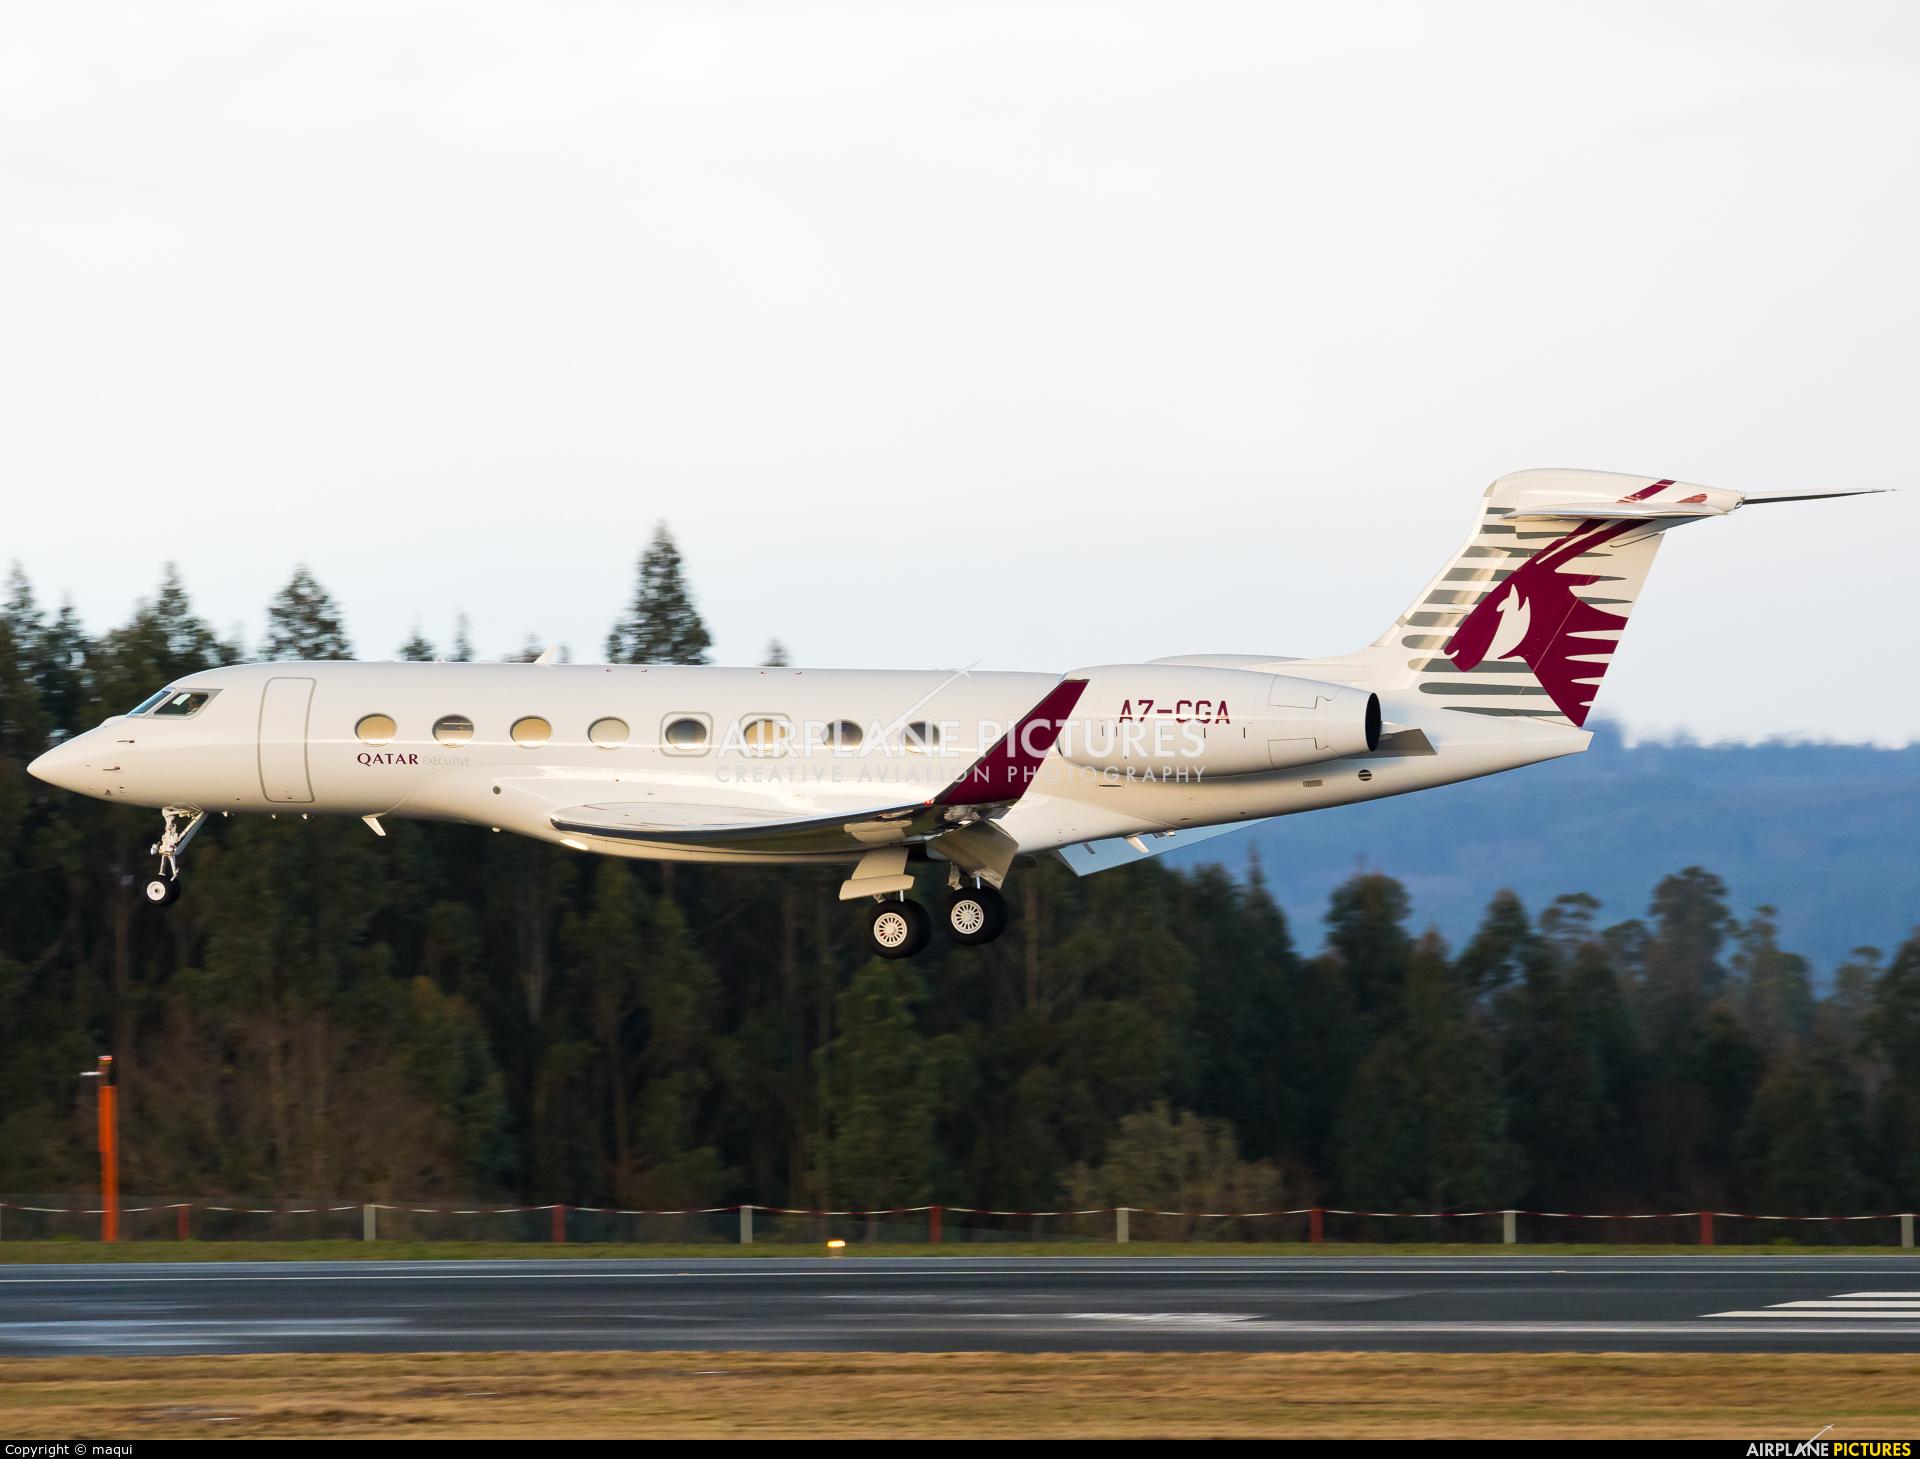 Qatar Executive A7-CGA aircraft at Santiago de Compostela